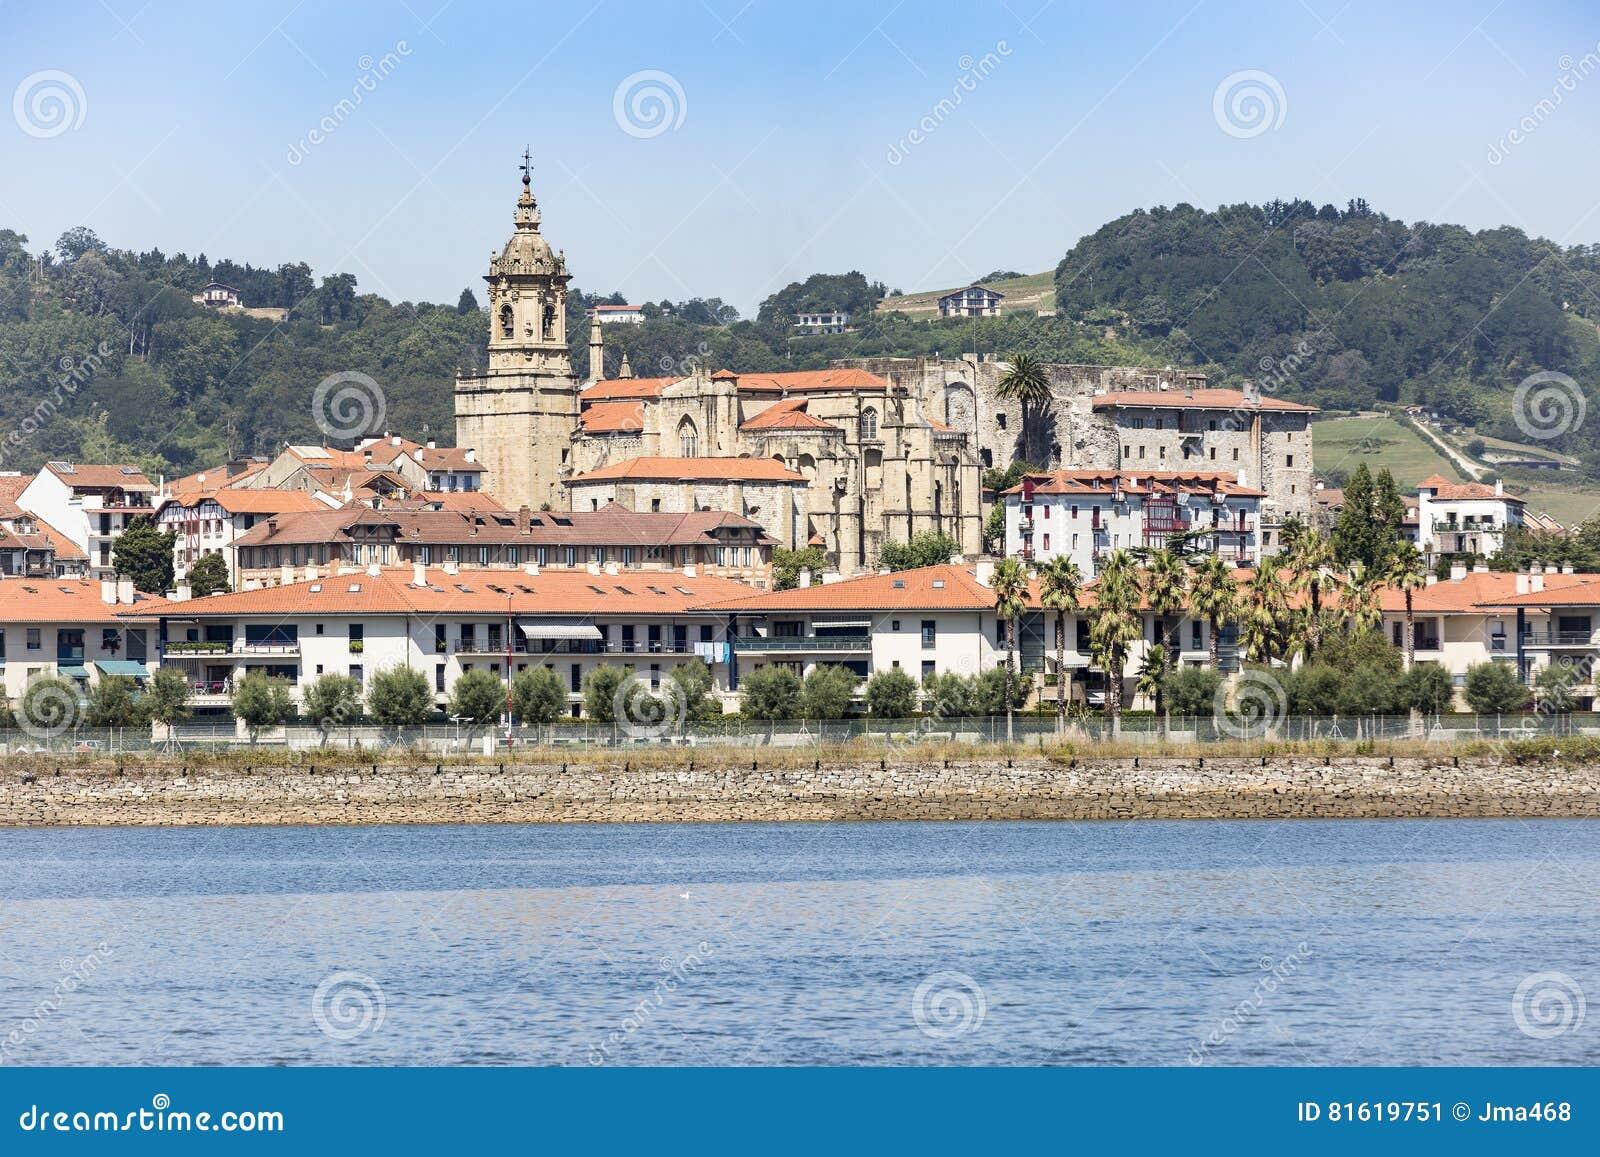 Widok Hondarribia miasteczko, Bidasoa rzeka i Nuestra Señora del Manzano kościół, Gipuzkoa, Baskijski kraj, Hiszpania